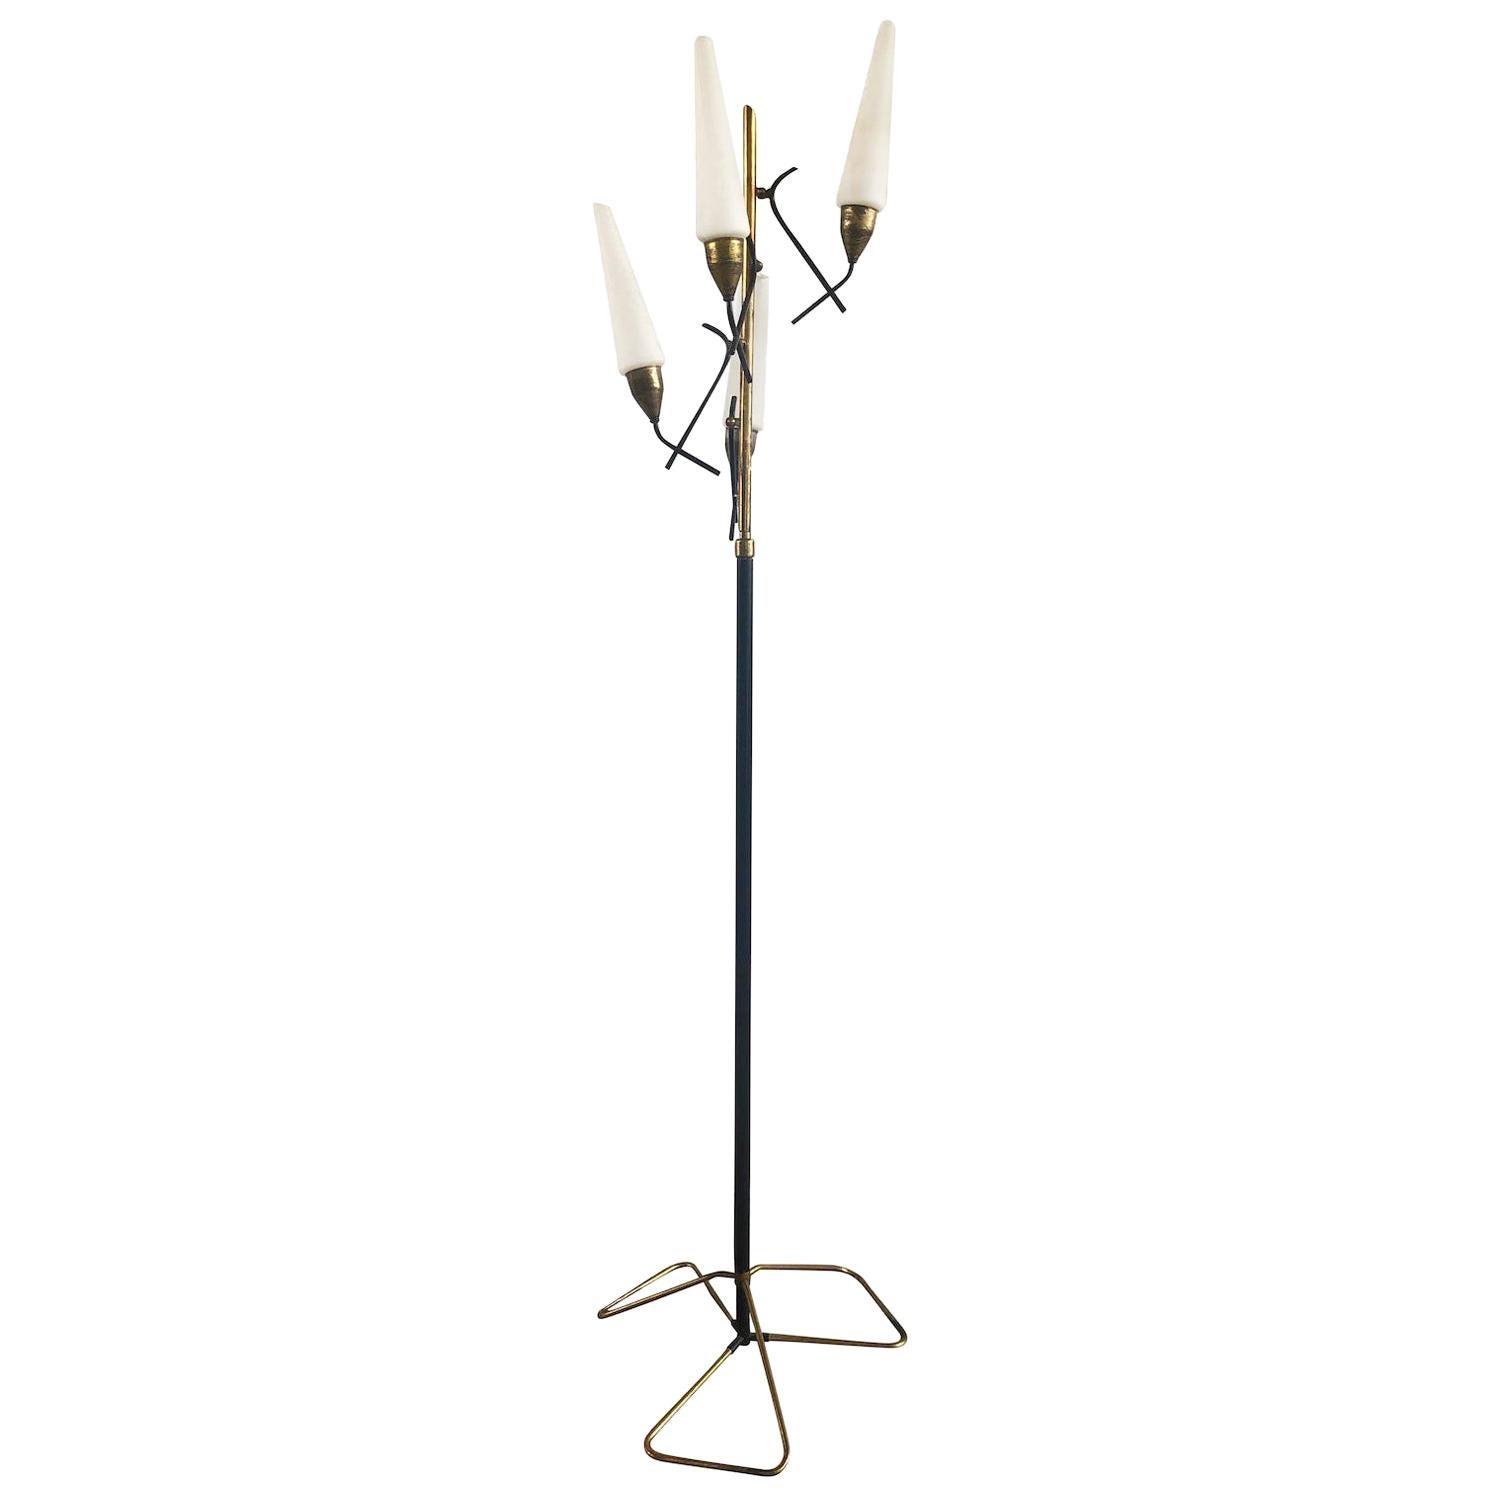 20th Century Black Italian Iron, Brass Floor Lamp by Stilnovo